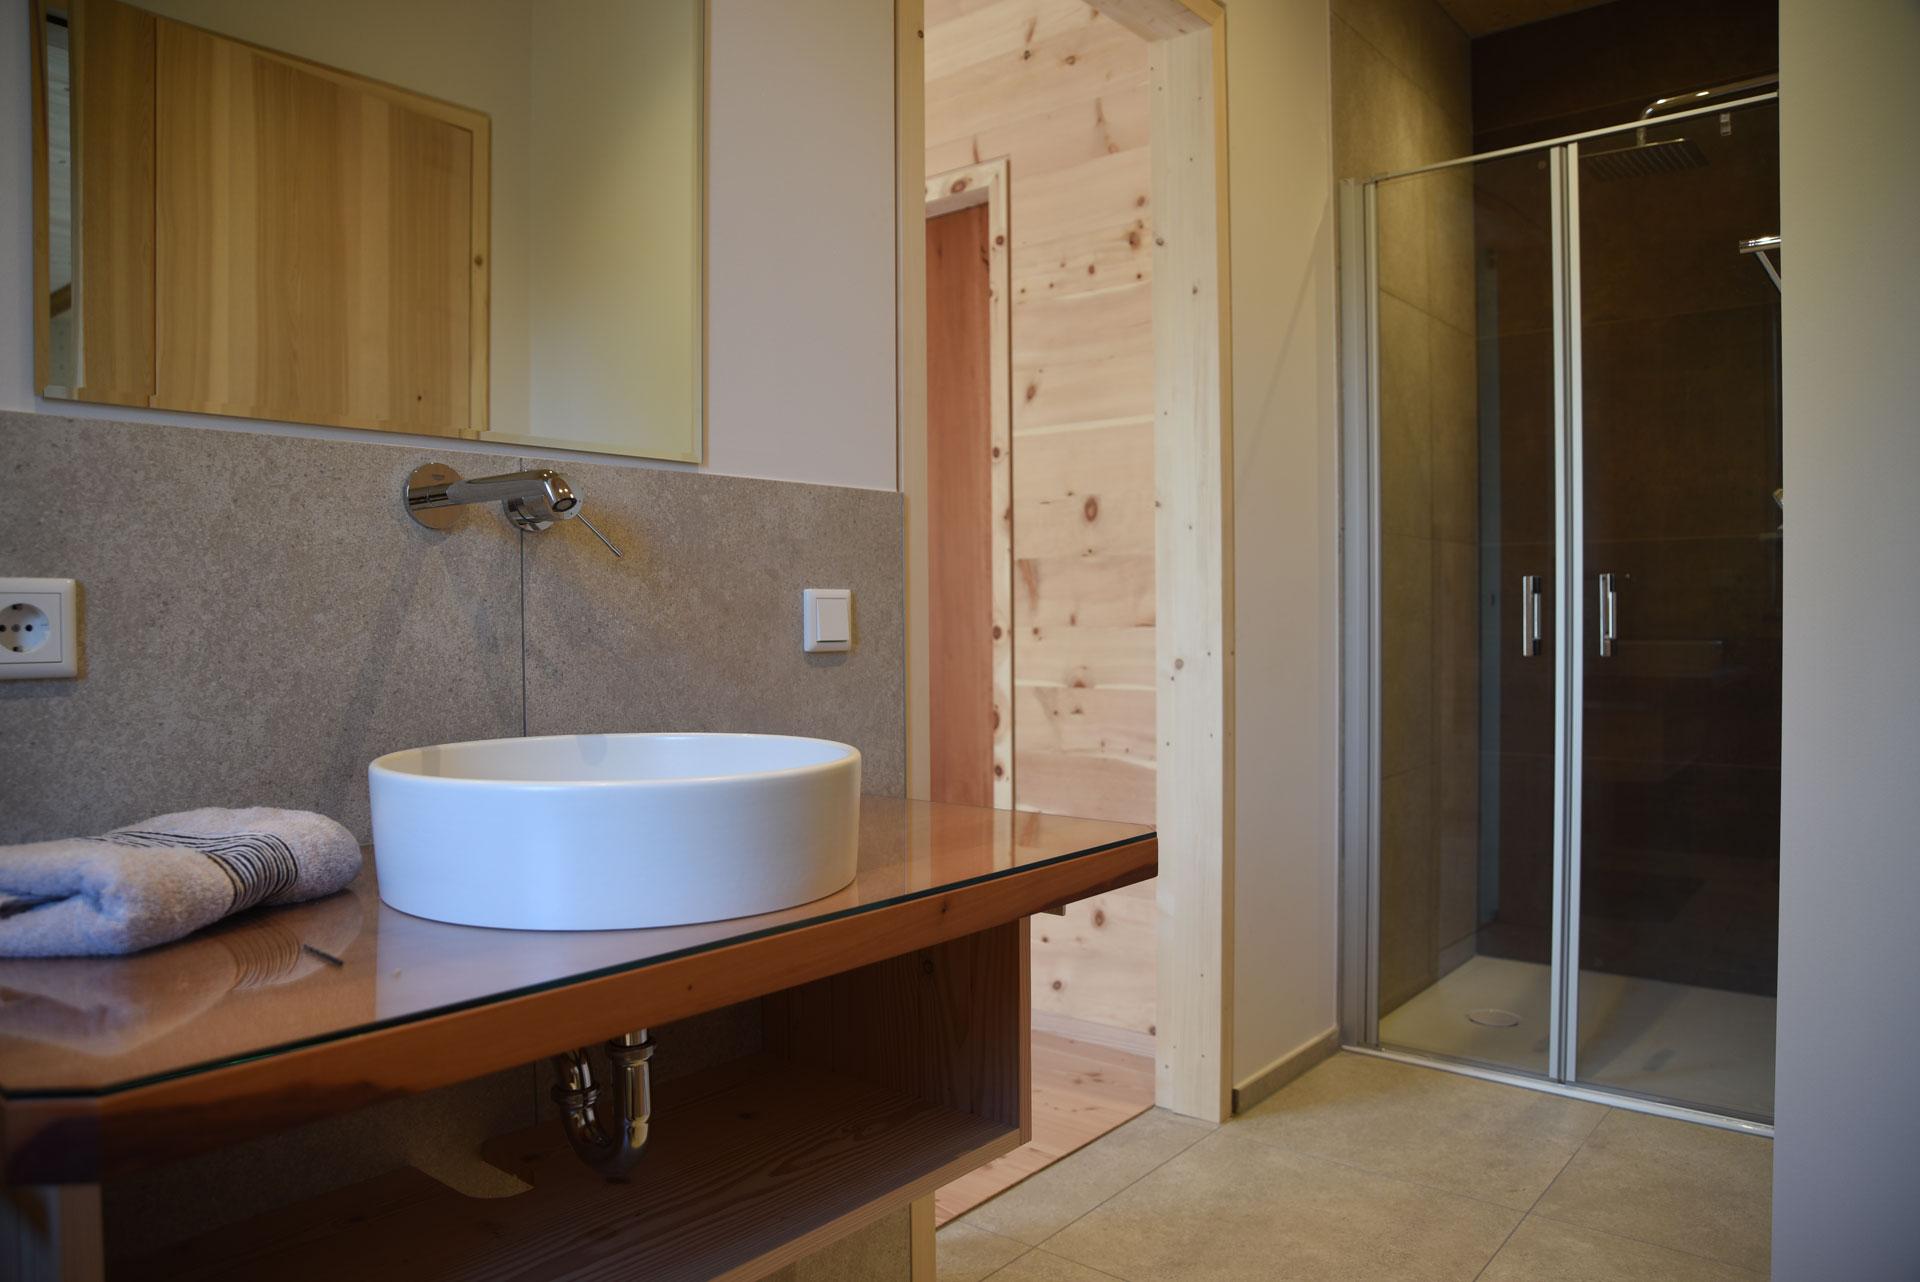 Dusche im Holz100 Haus Bad Feilnbach